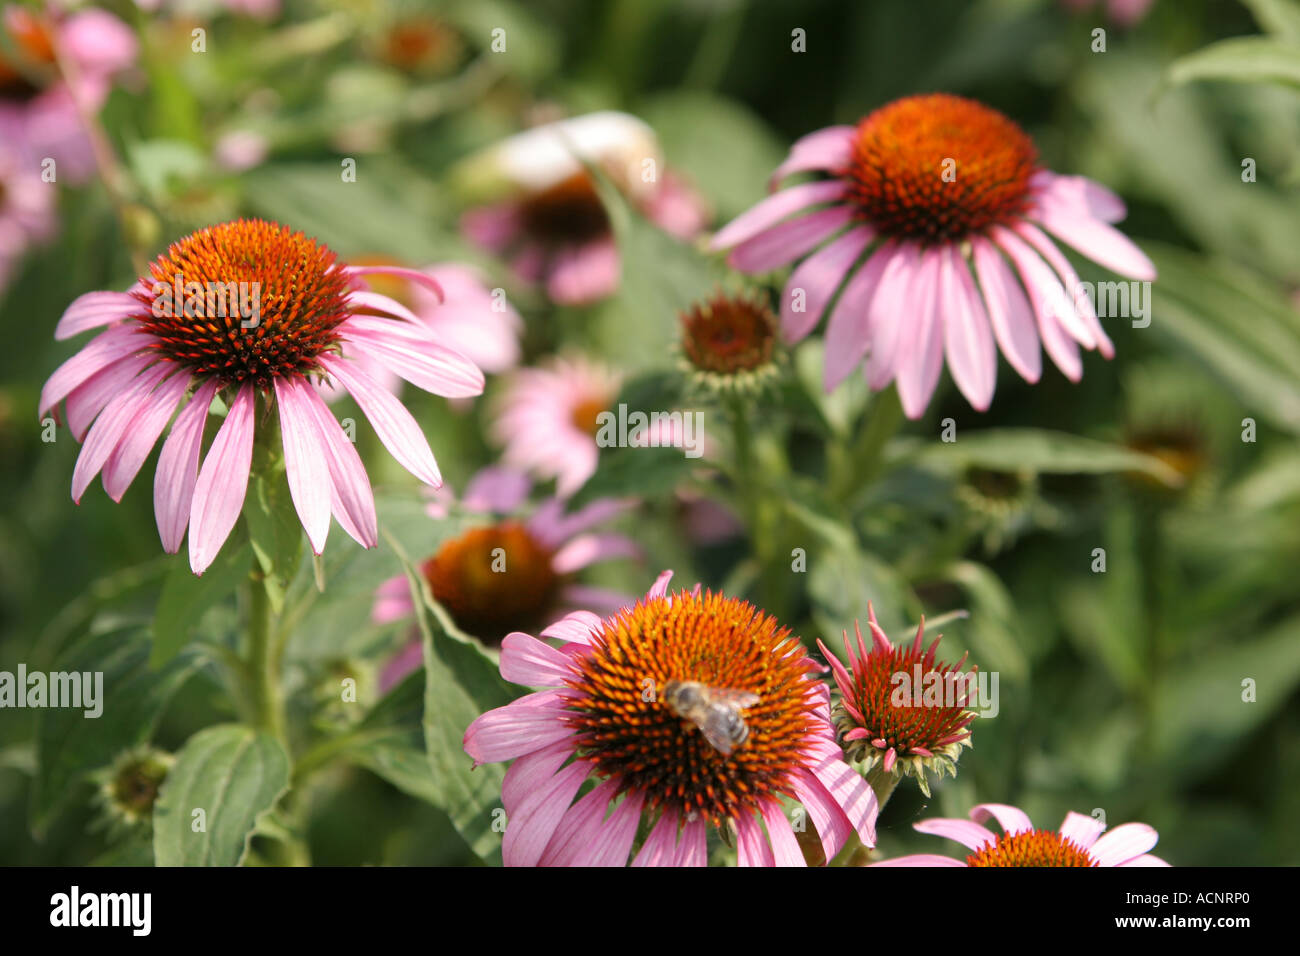 Cut leaved coneflowerEchinacea purpur - Sonnenhut  Echinacea purpur - Stock Image